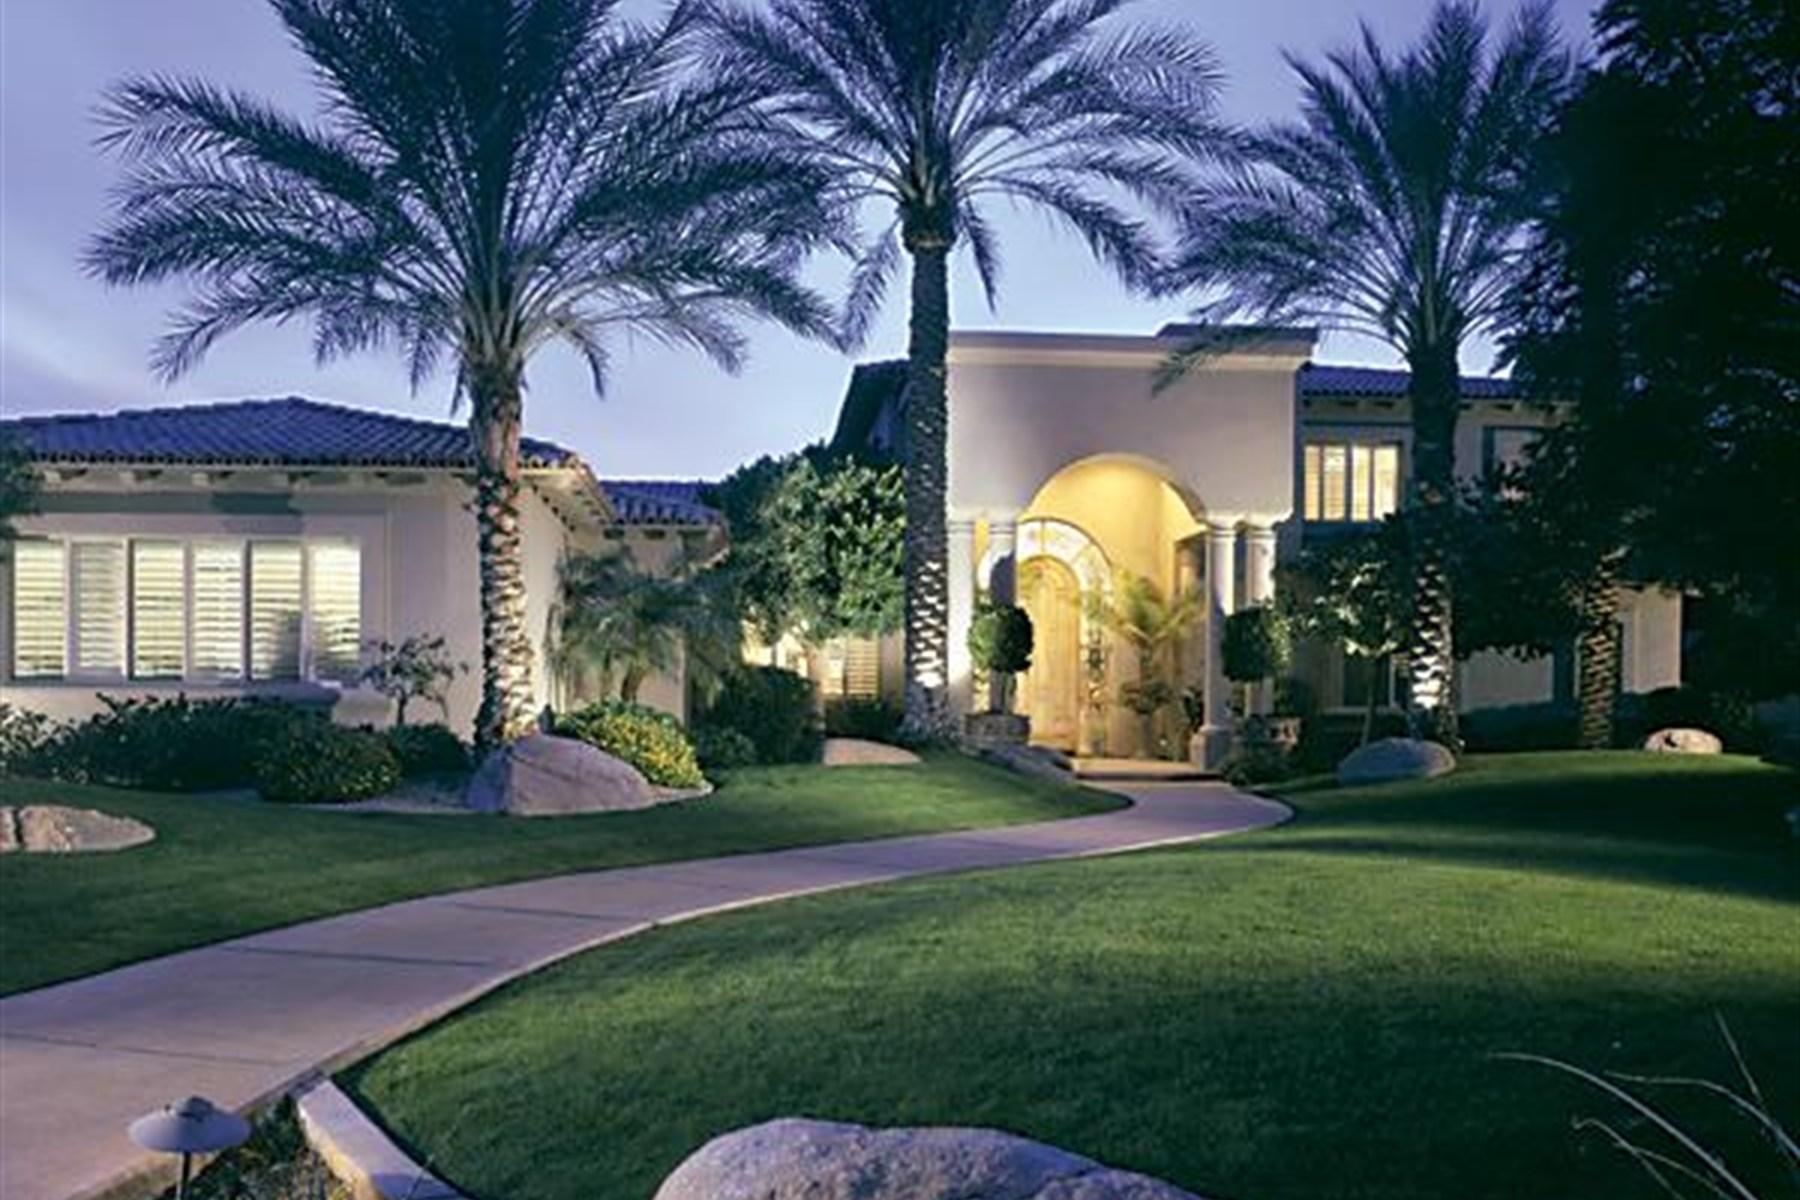 Single Family Home for Sale at Custom home on huge .78 acre private culdesac hillside lot. 3429 E Tonto DR Phoenix, Arizona 85044 United States